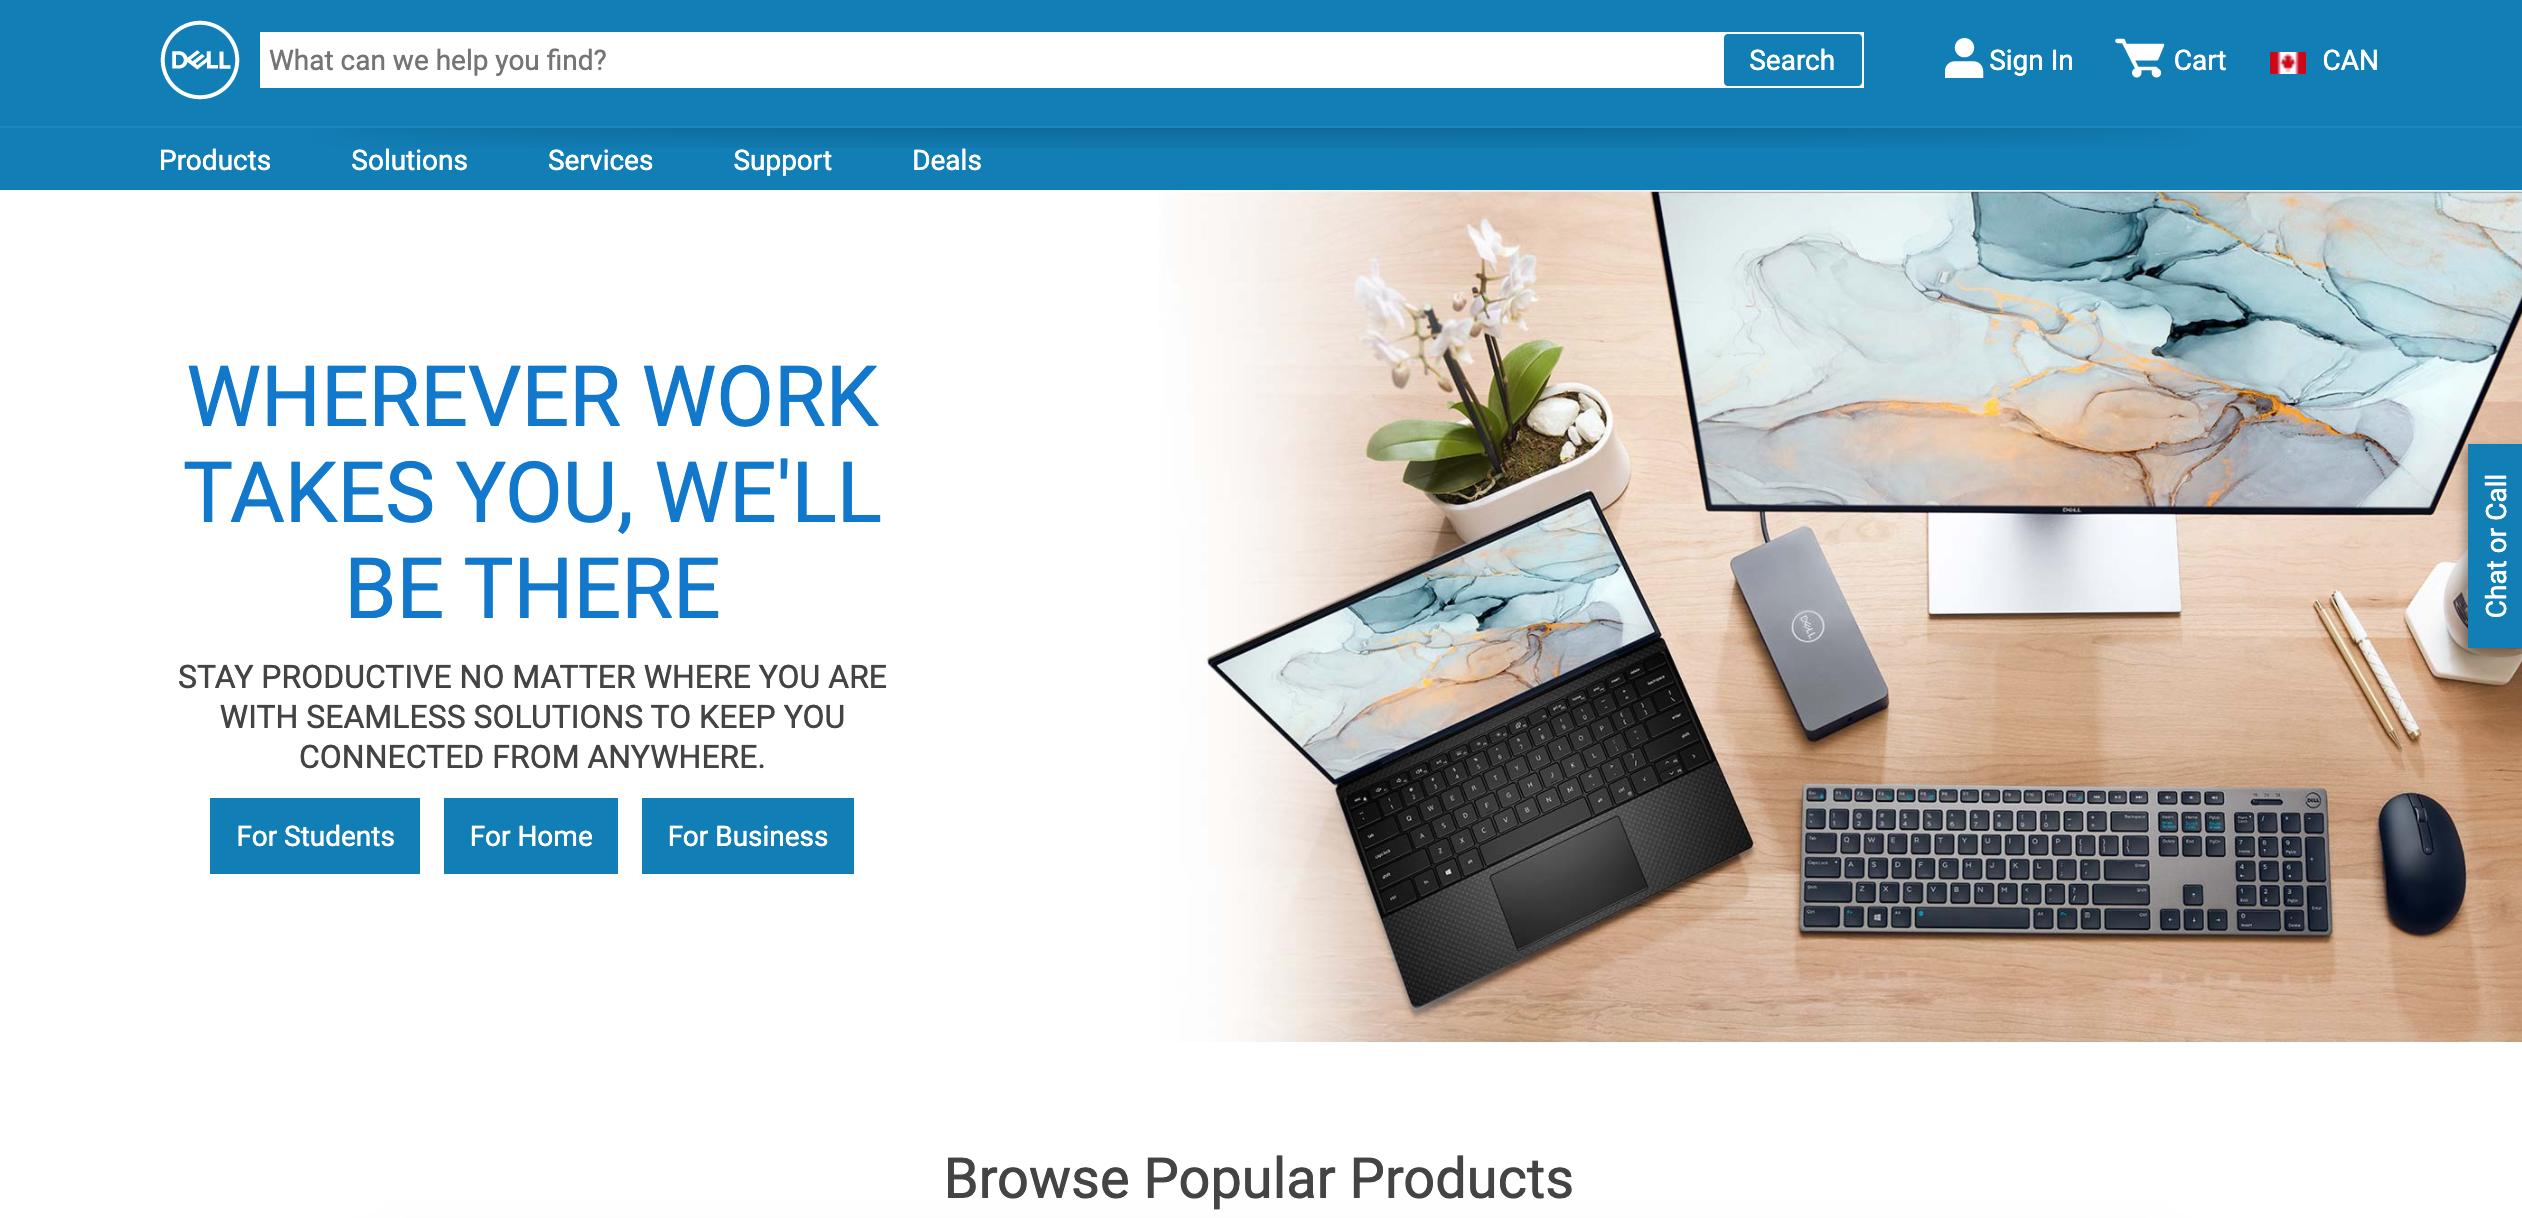 Dell new website design